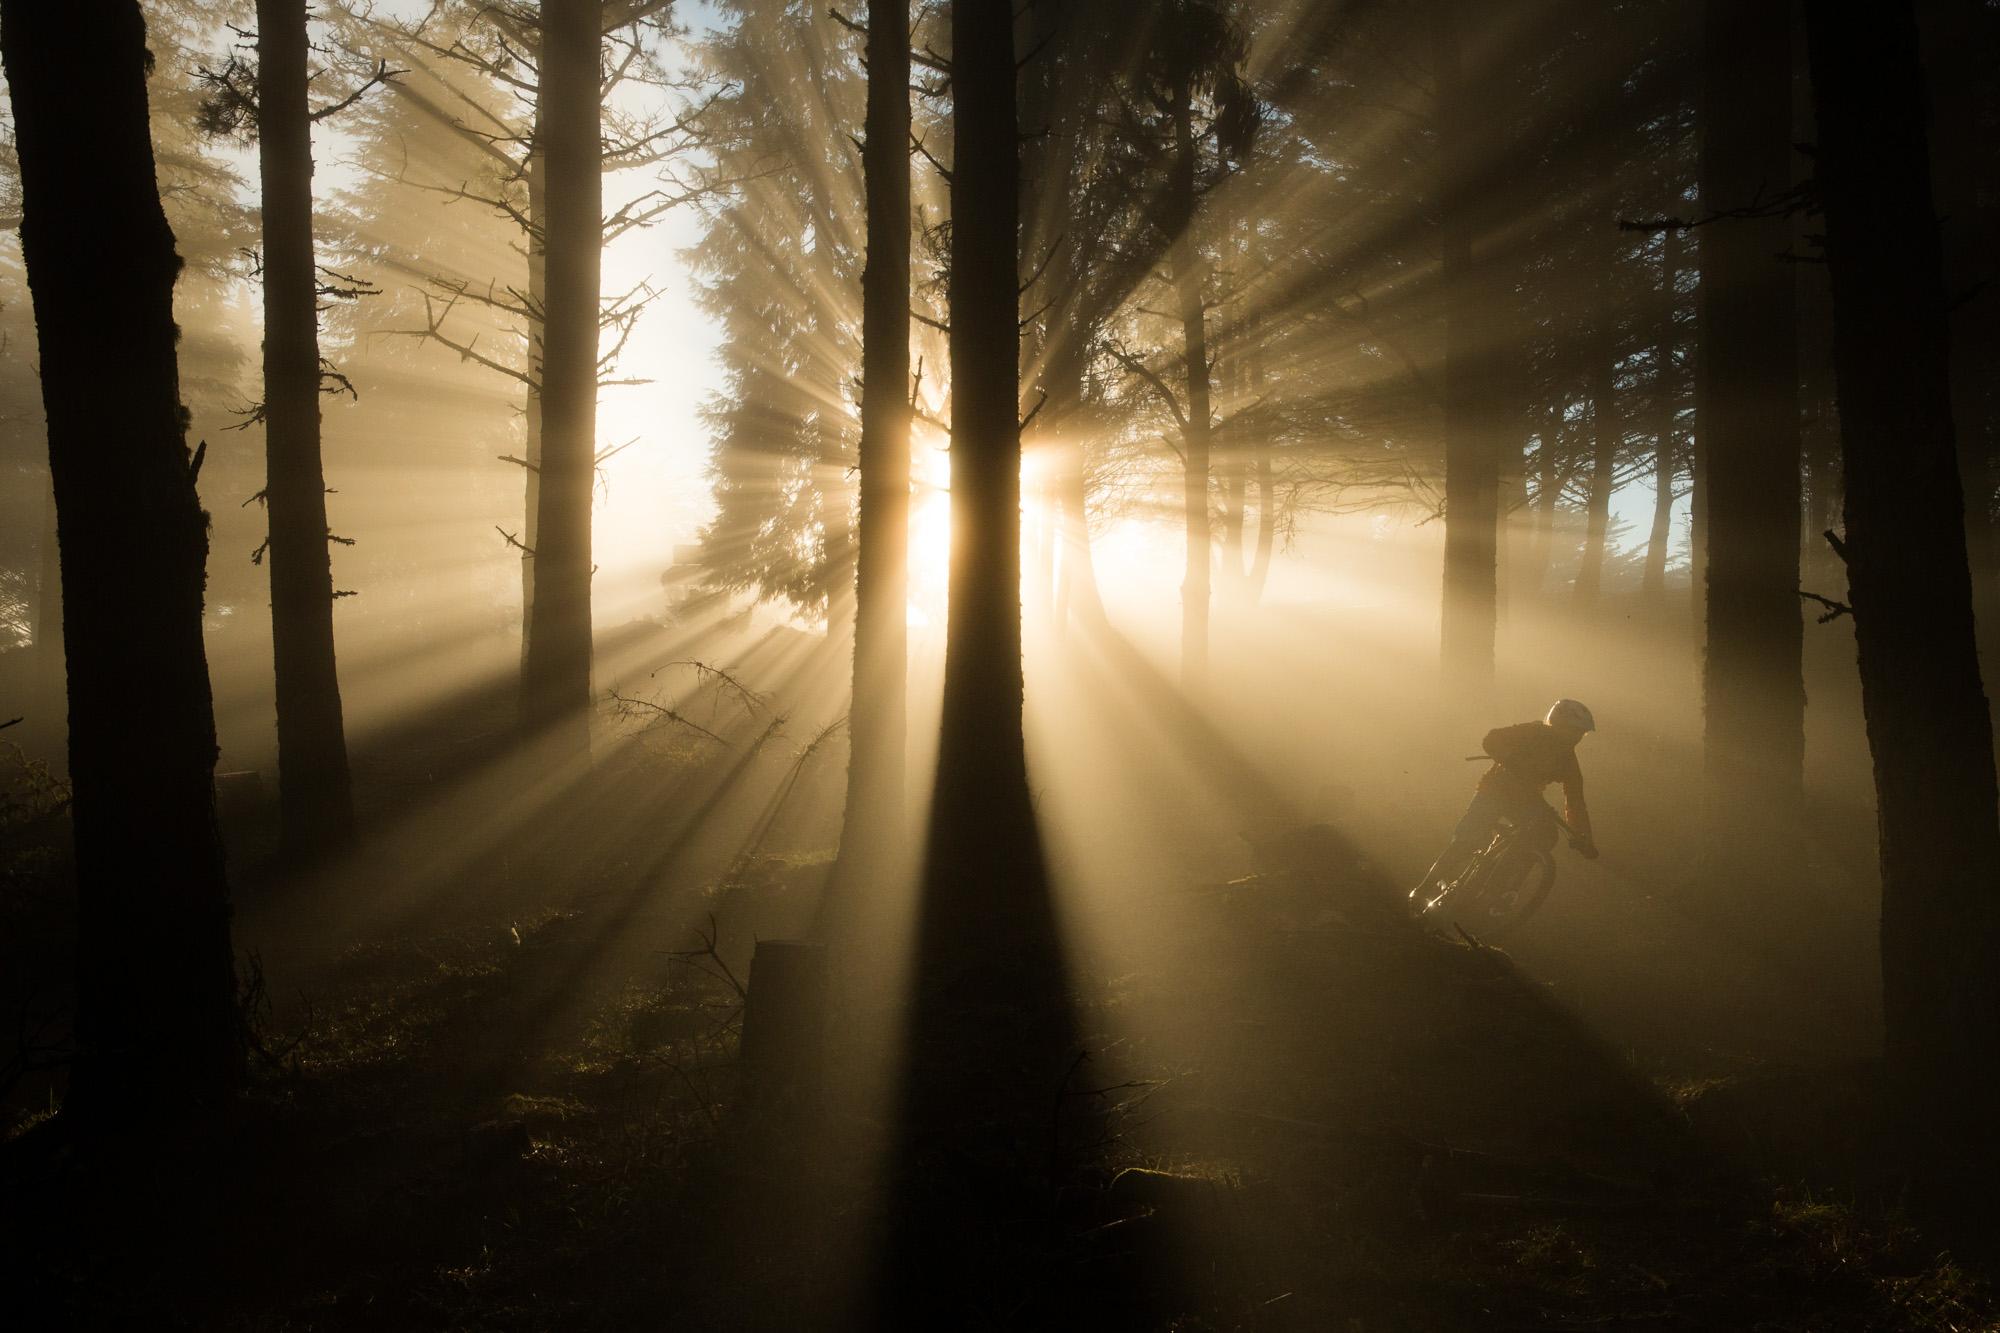 SLorencePhoto_RideMtns_002.JPG